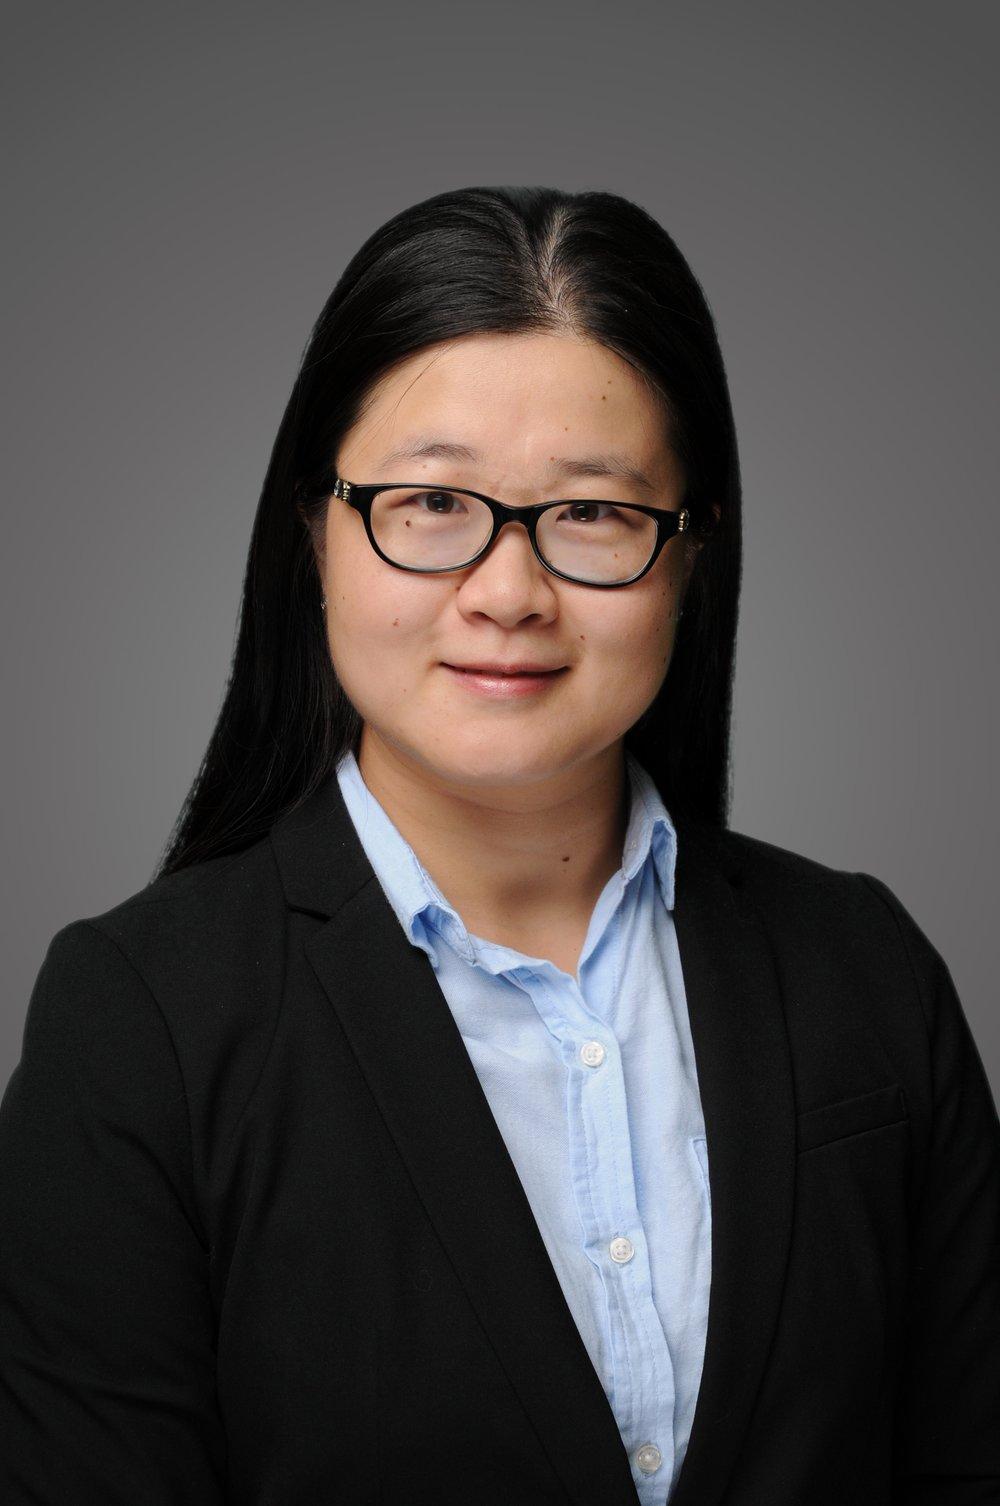 Chaoyun Bao   Conference Committee  cb4084@stern.nyu.edu